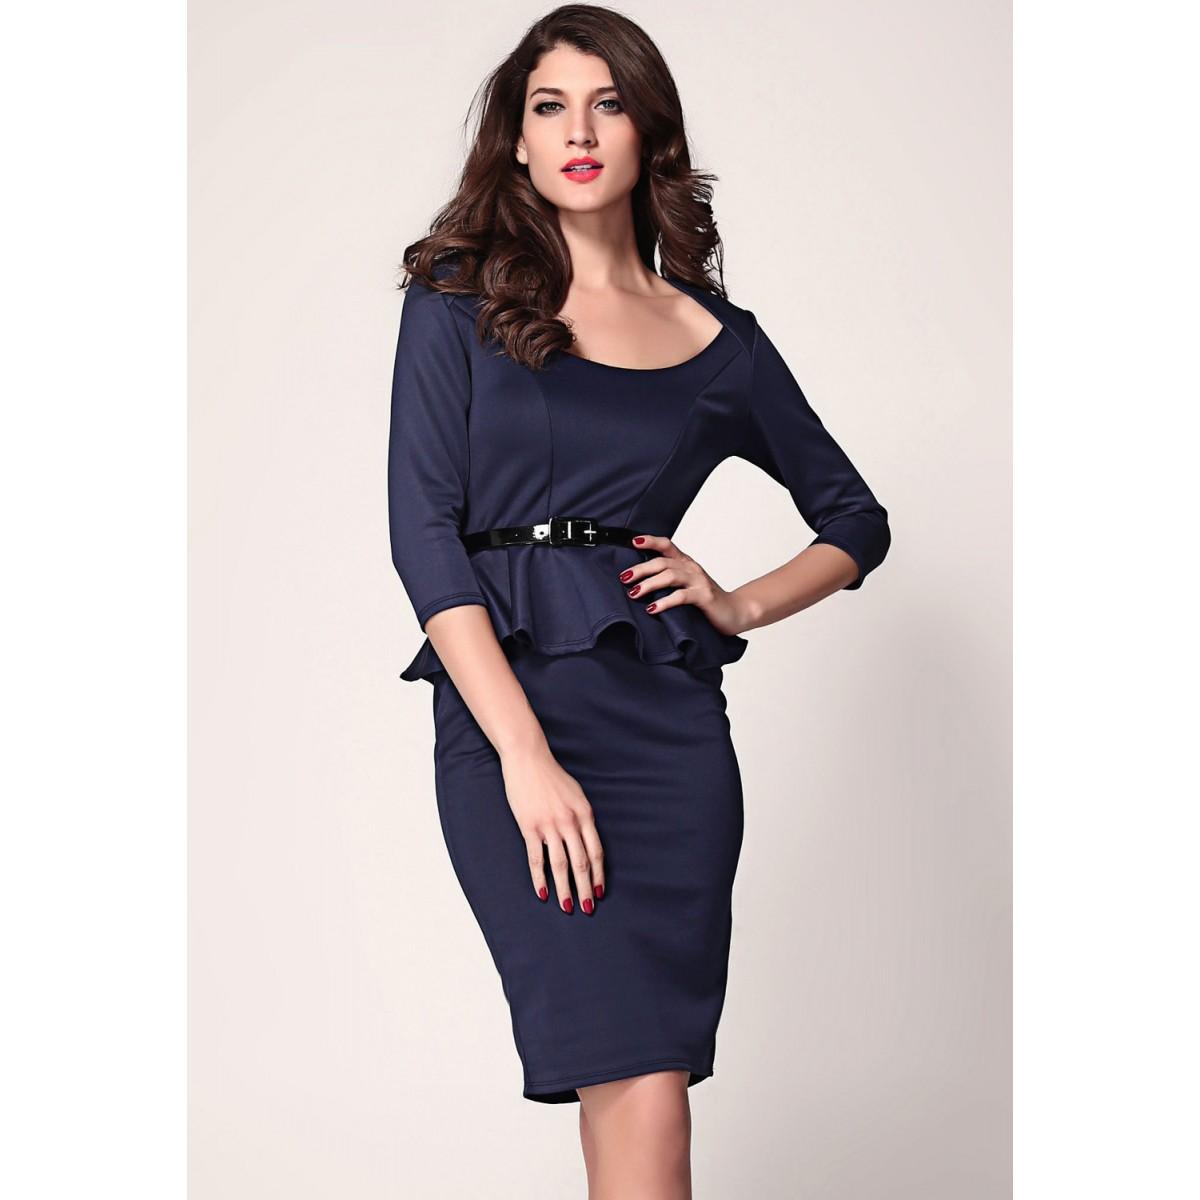 Gojilove Blue Long Sleeve Belted Peplum Midi Dress